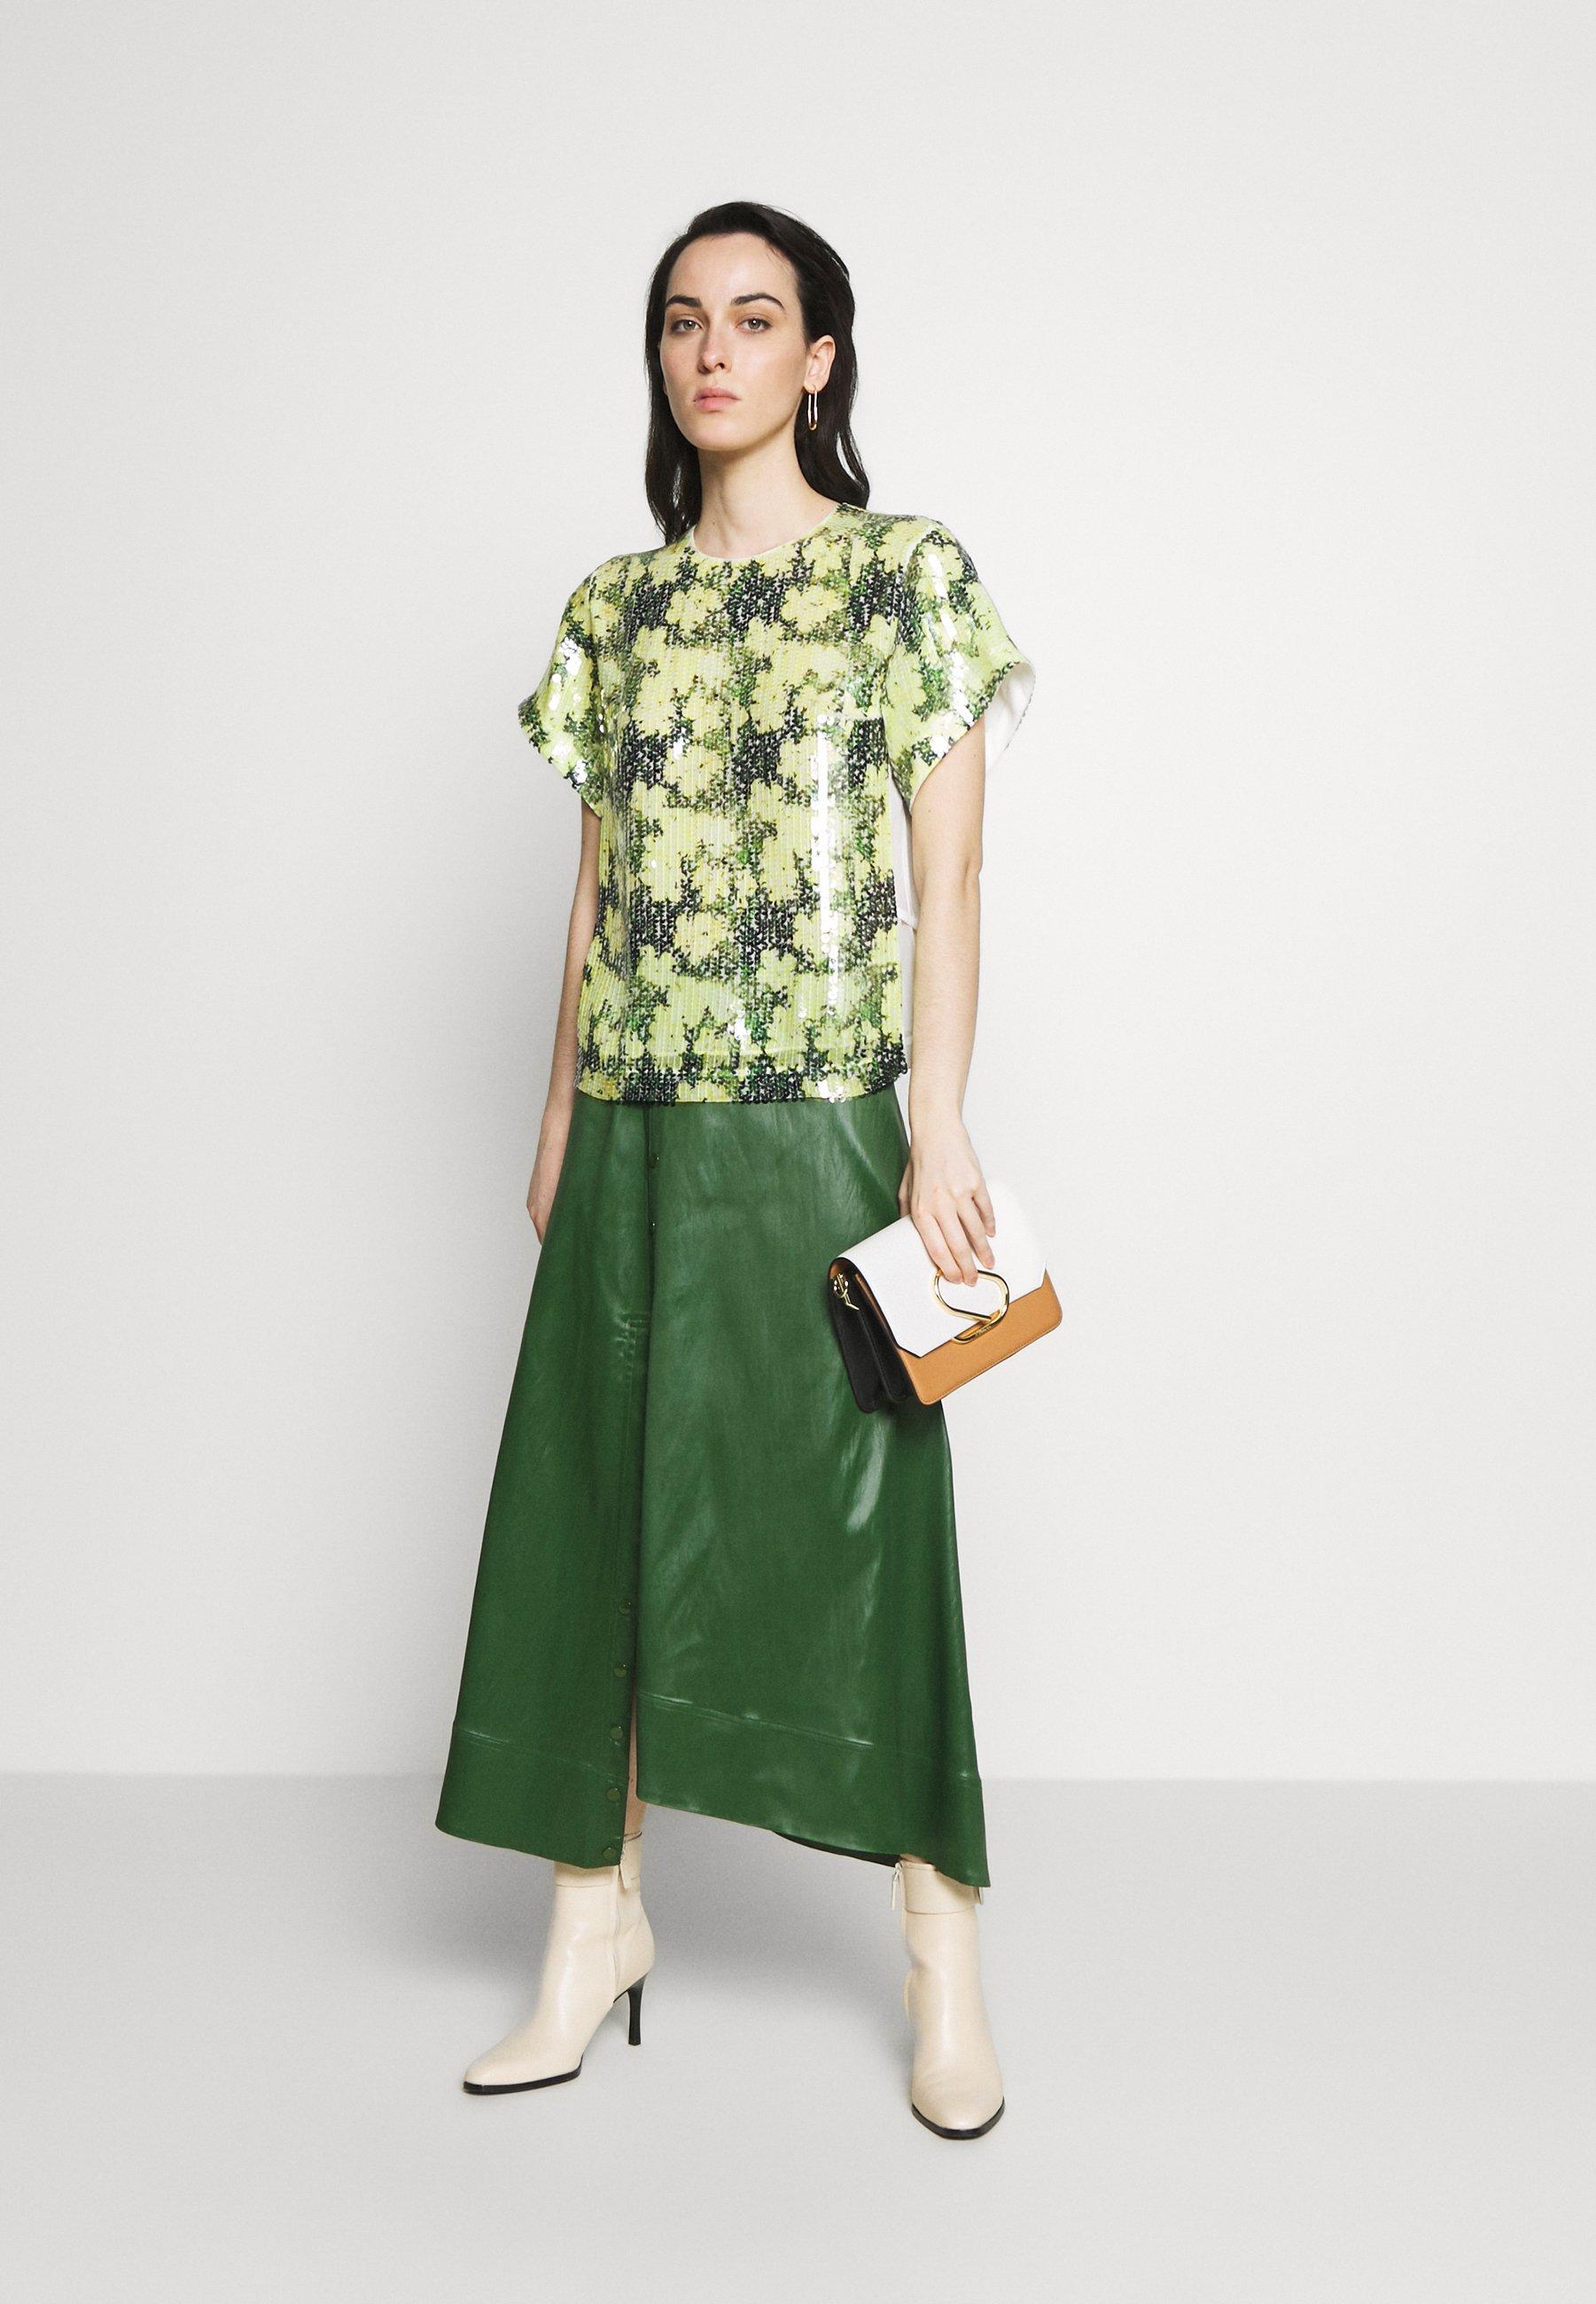 3.1 Phillip Lim Daisy Print Sequin - Blus Yellow